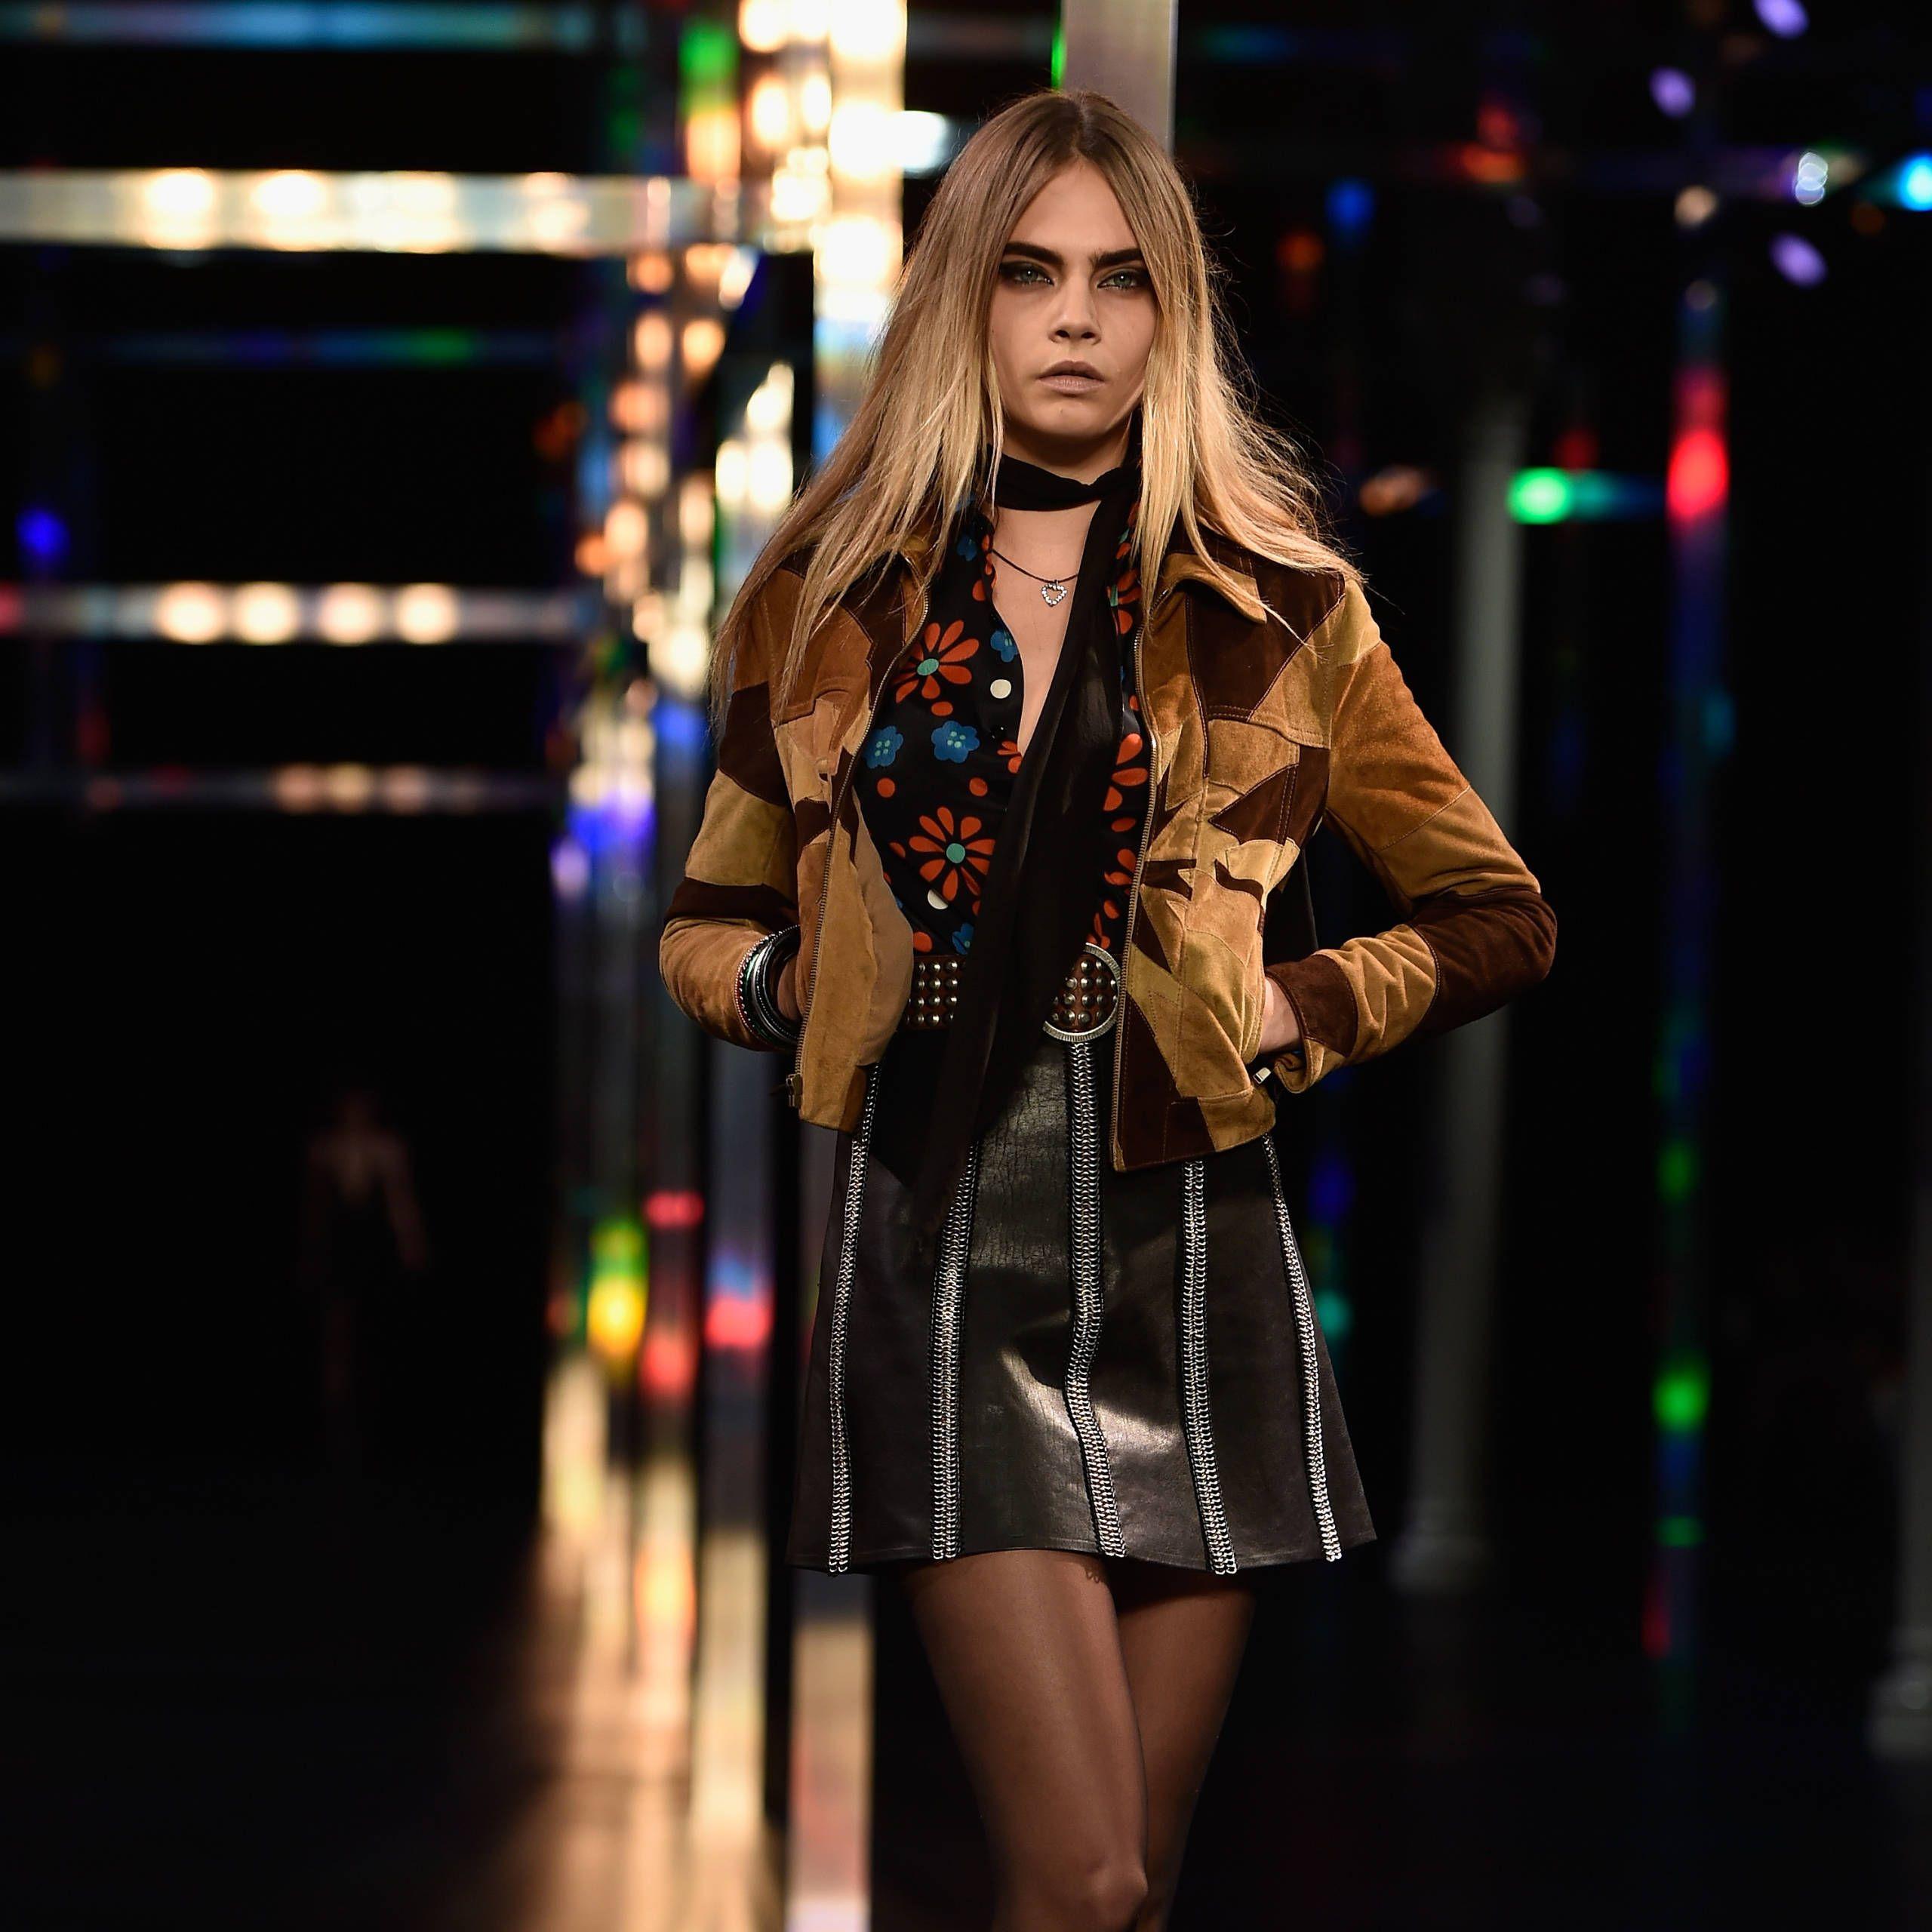 Cara Delevingne Saint Laurent spring 2015 catwalk model Paris fashion week